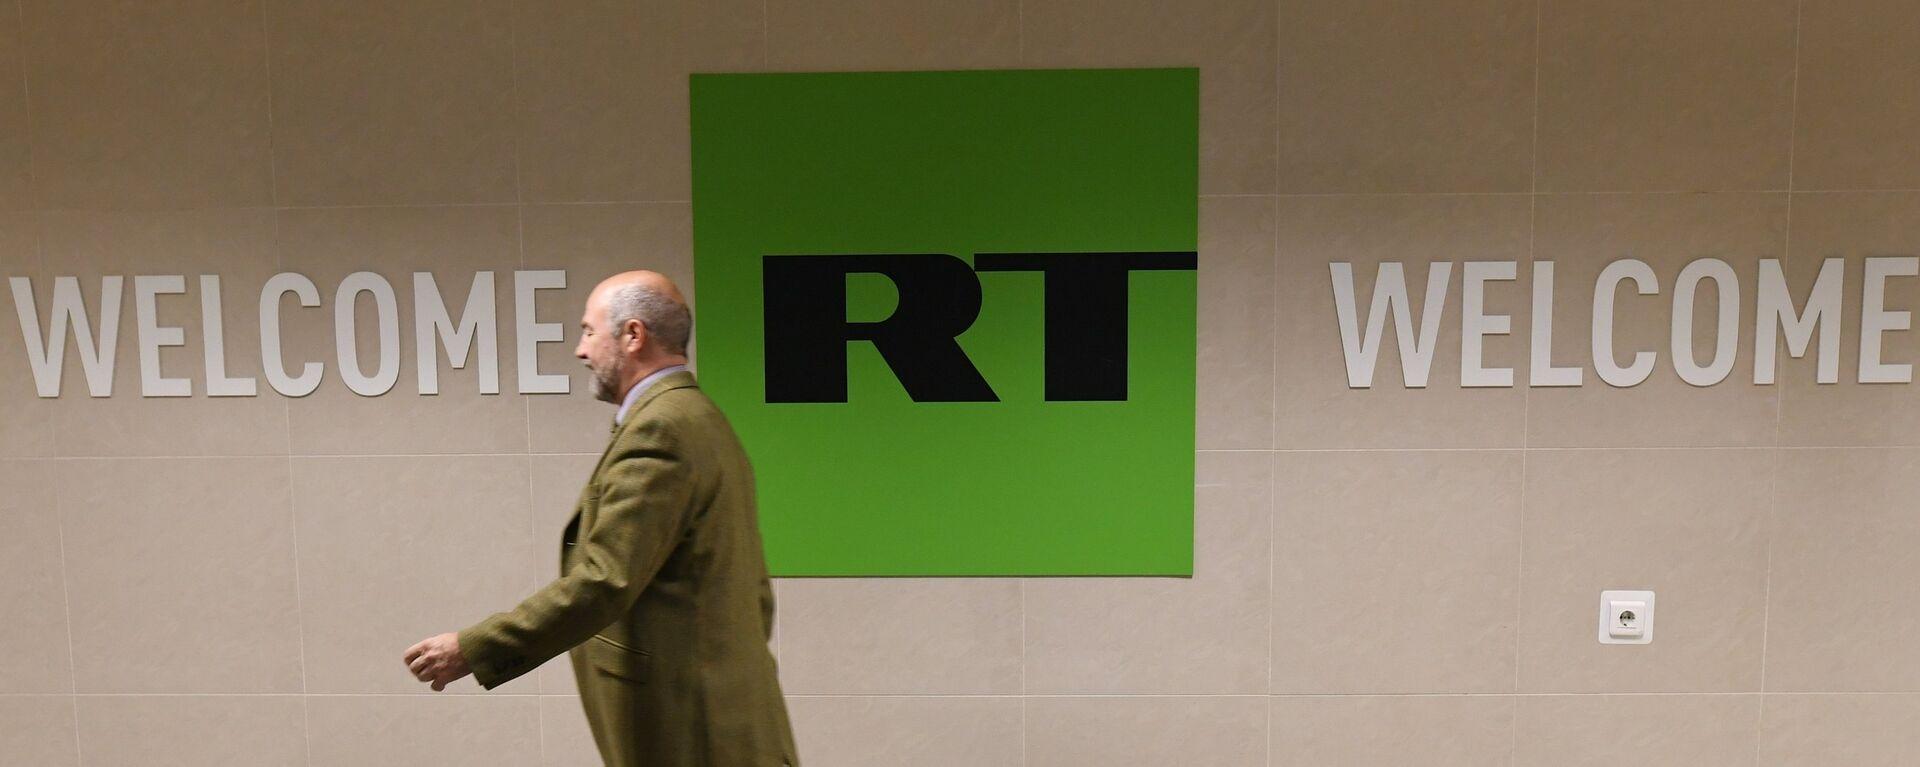 Офис телеканала RT в Москве - Sputnik Латвия, 1920, 28.07.2021